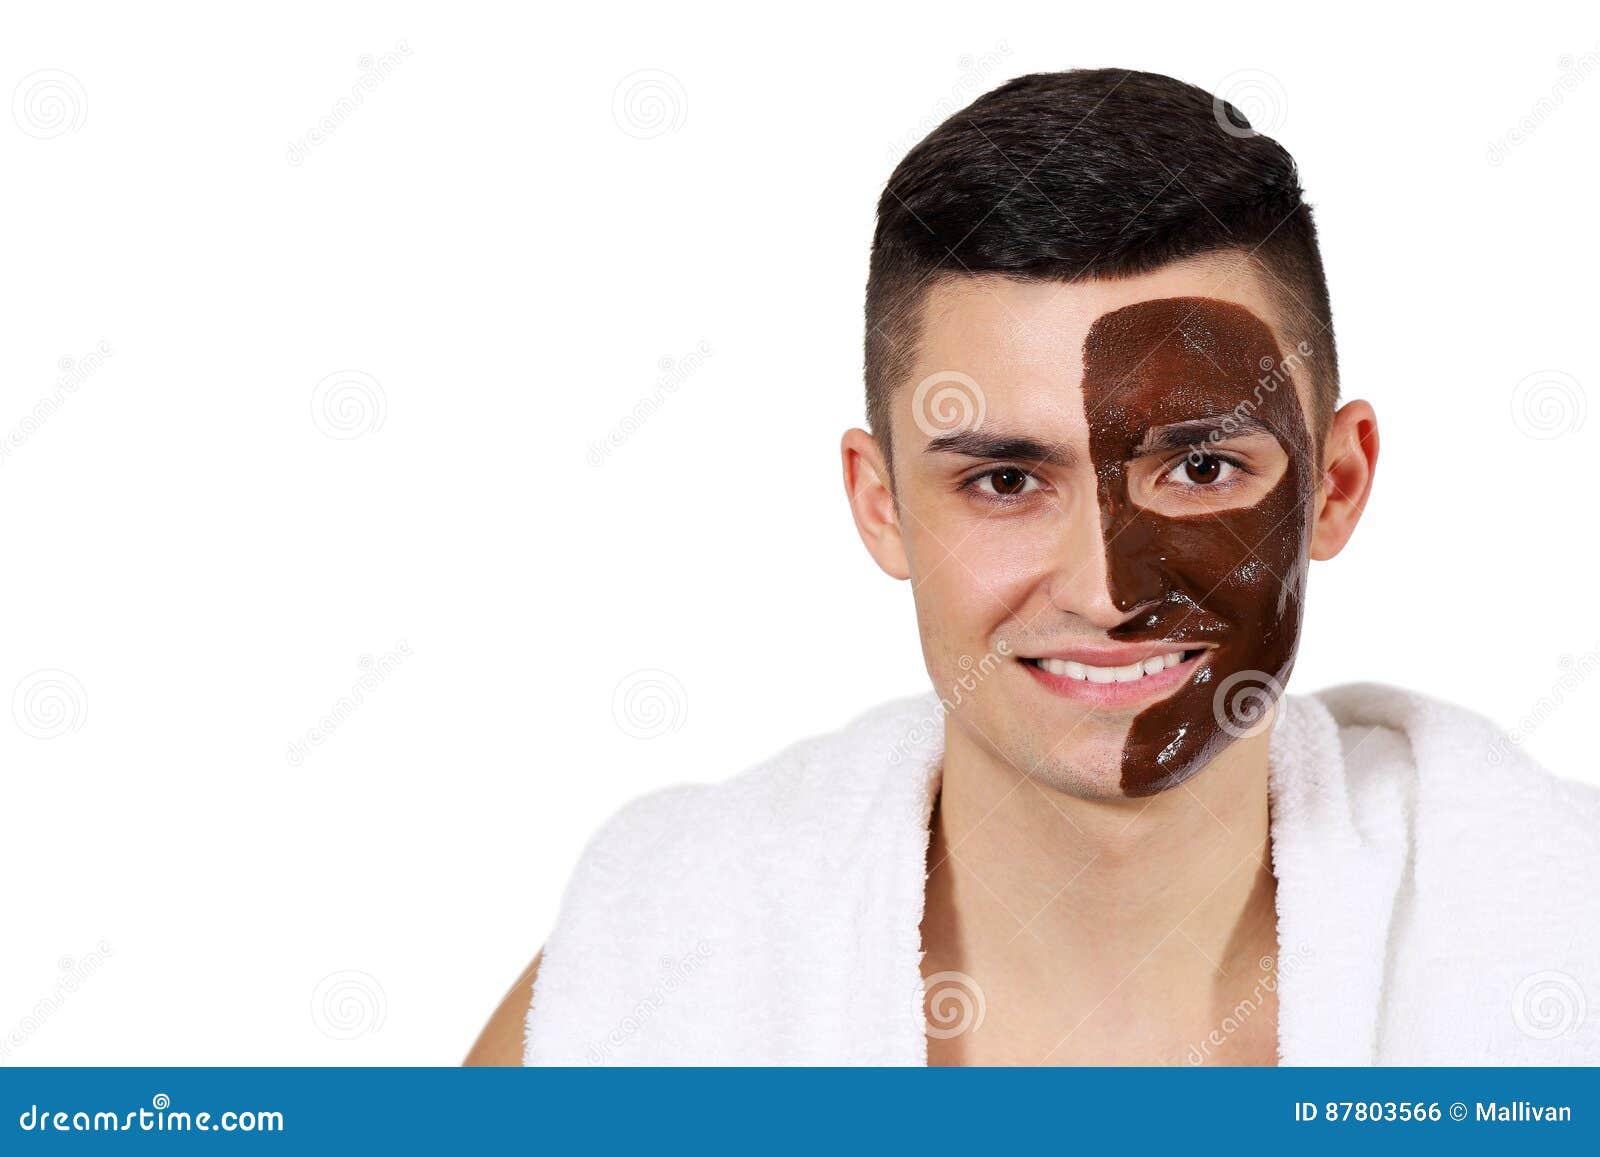 Idea and chocolate facial for men